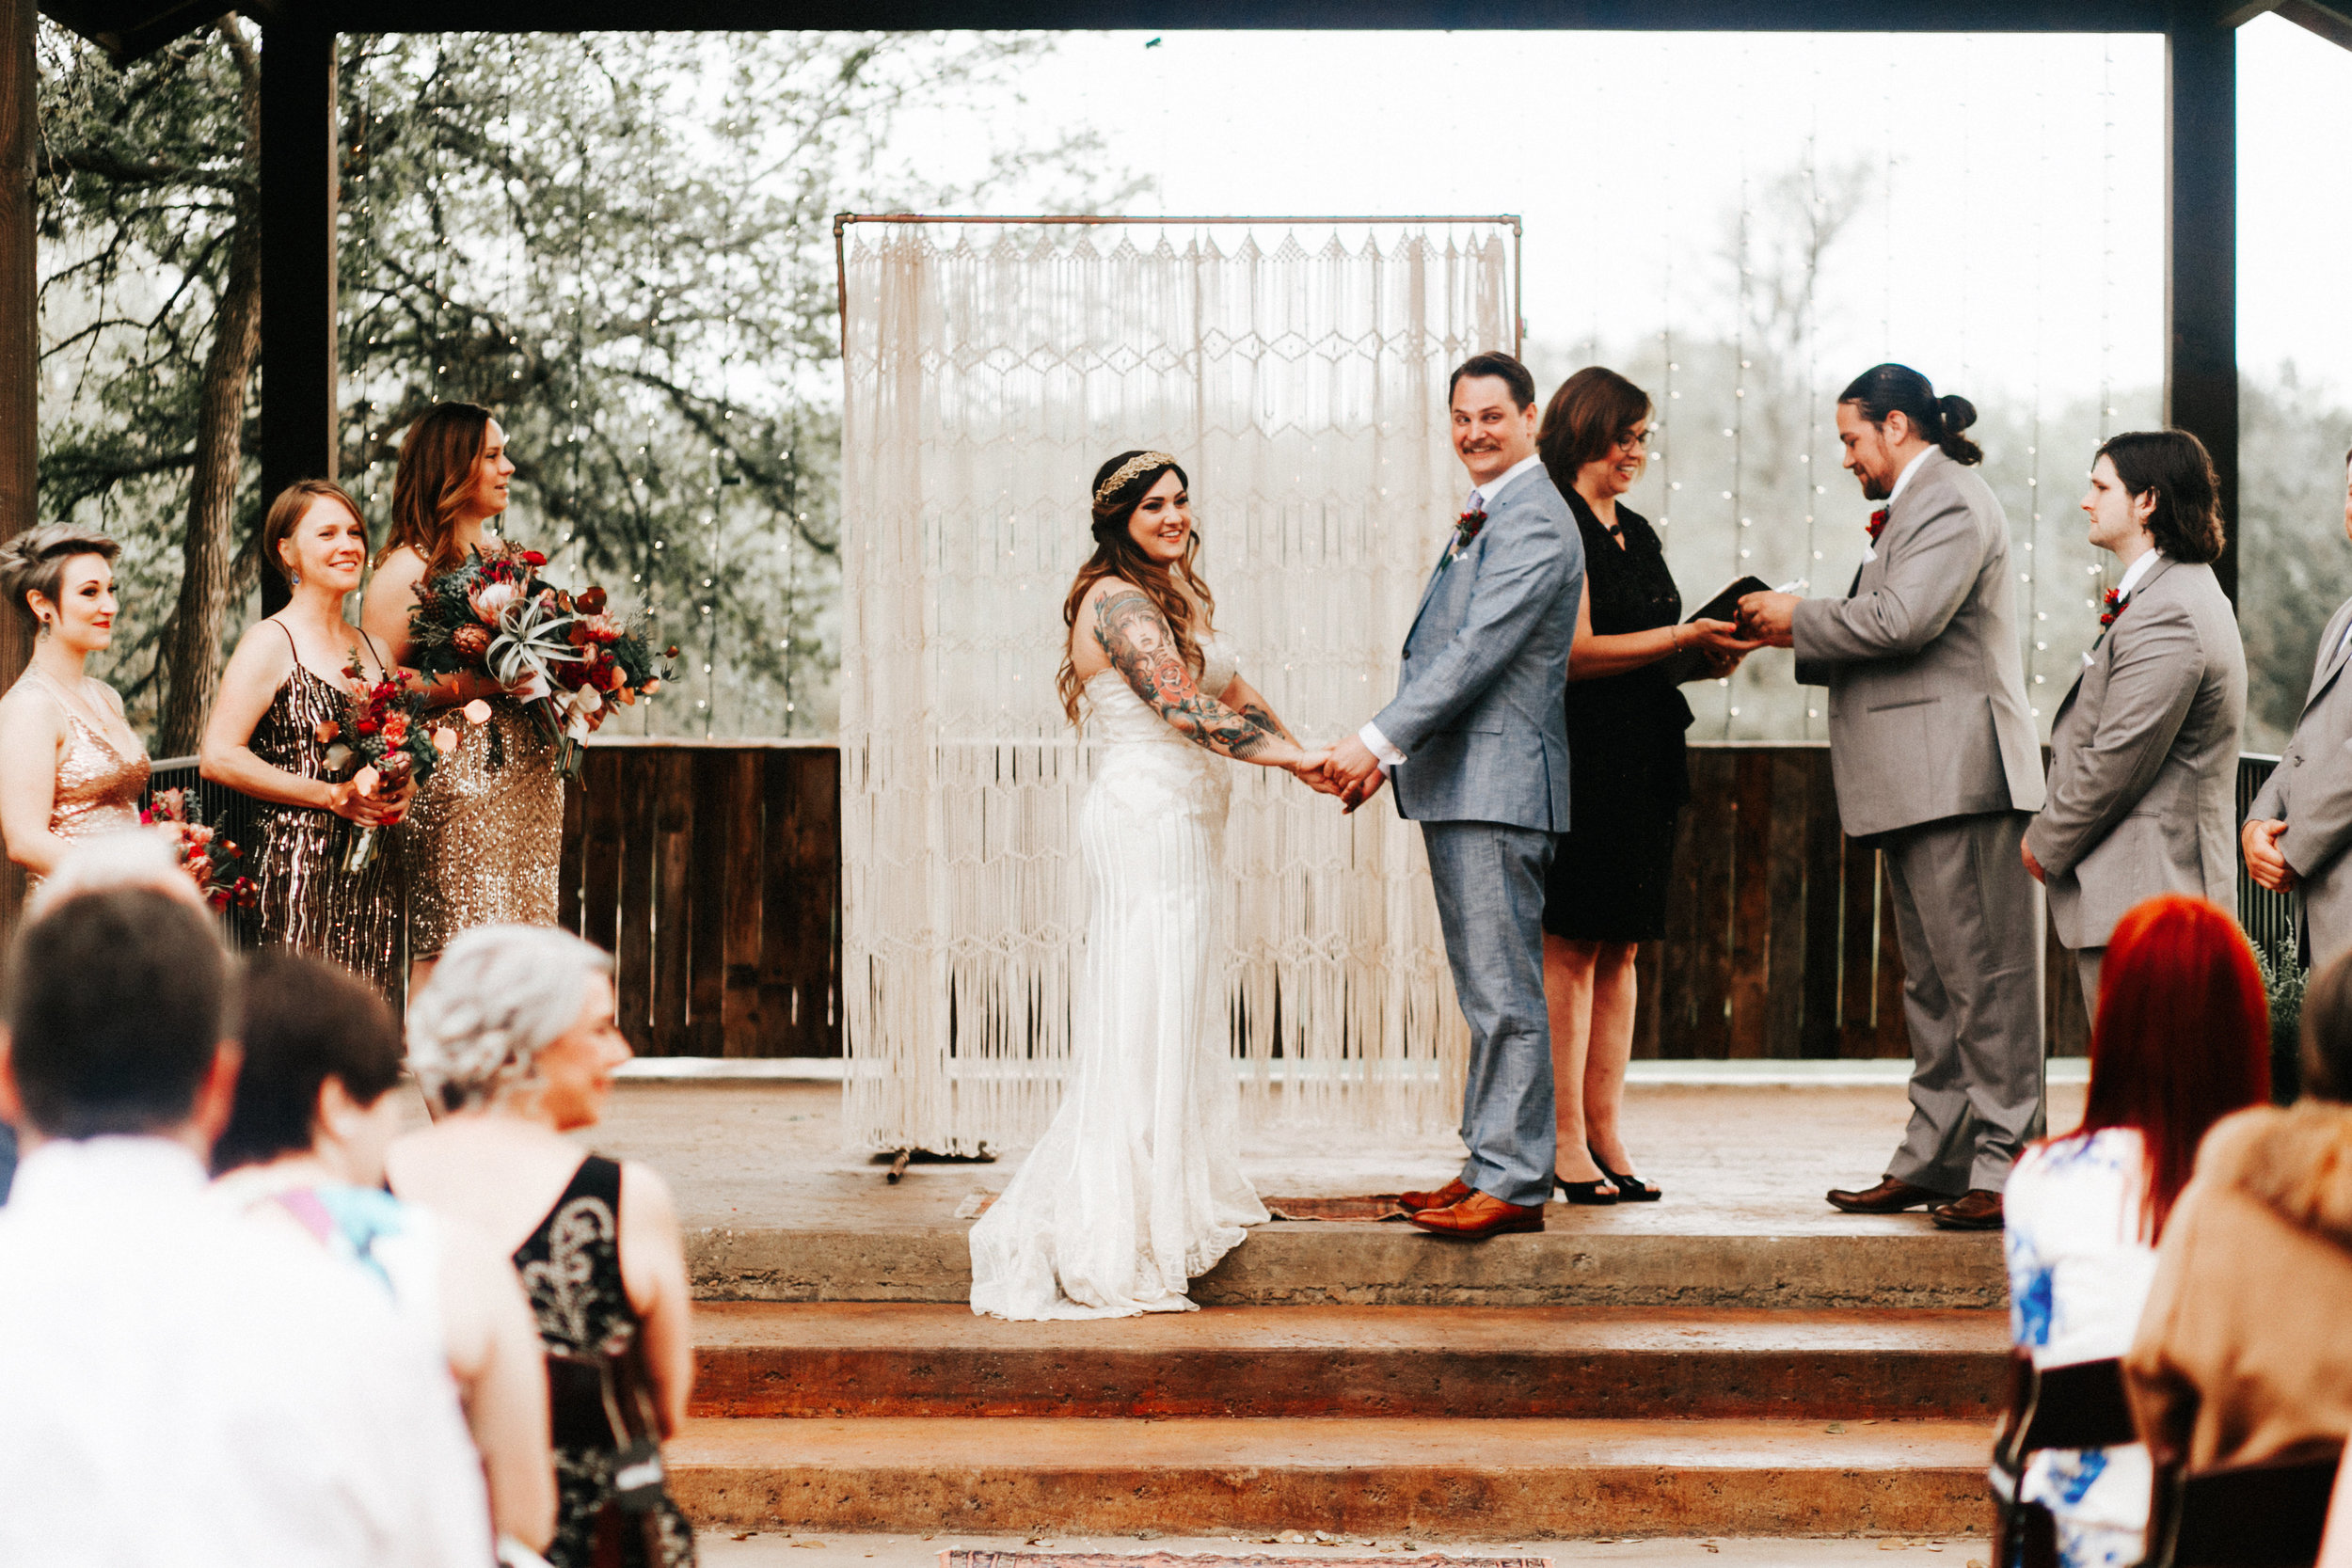 austin-wedding-photographer-54.jpg